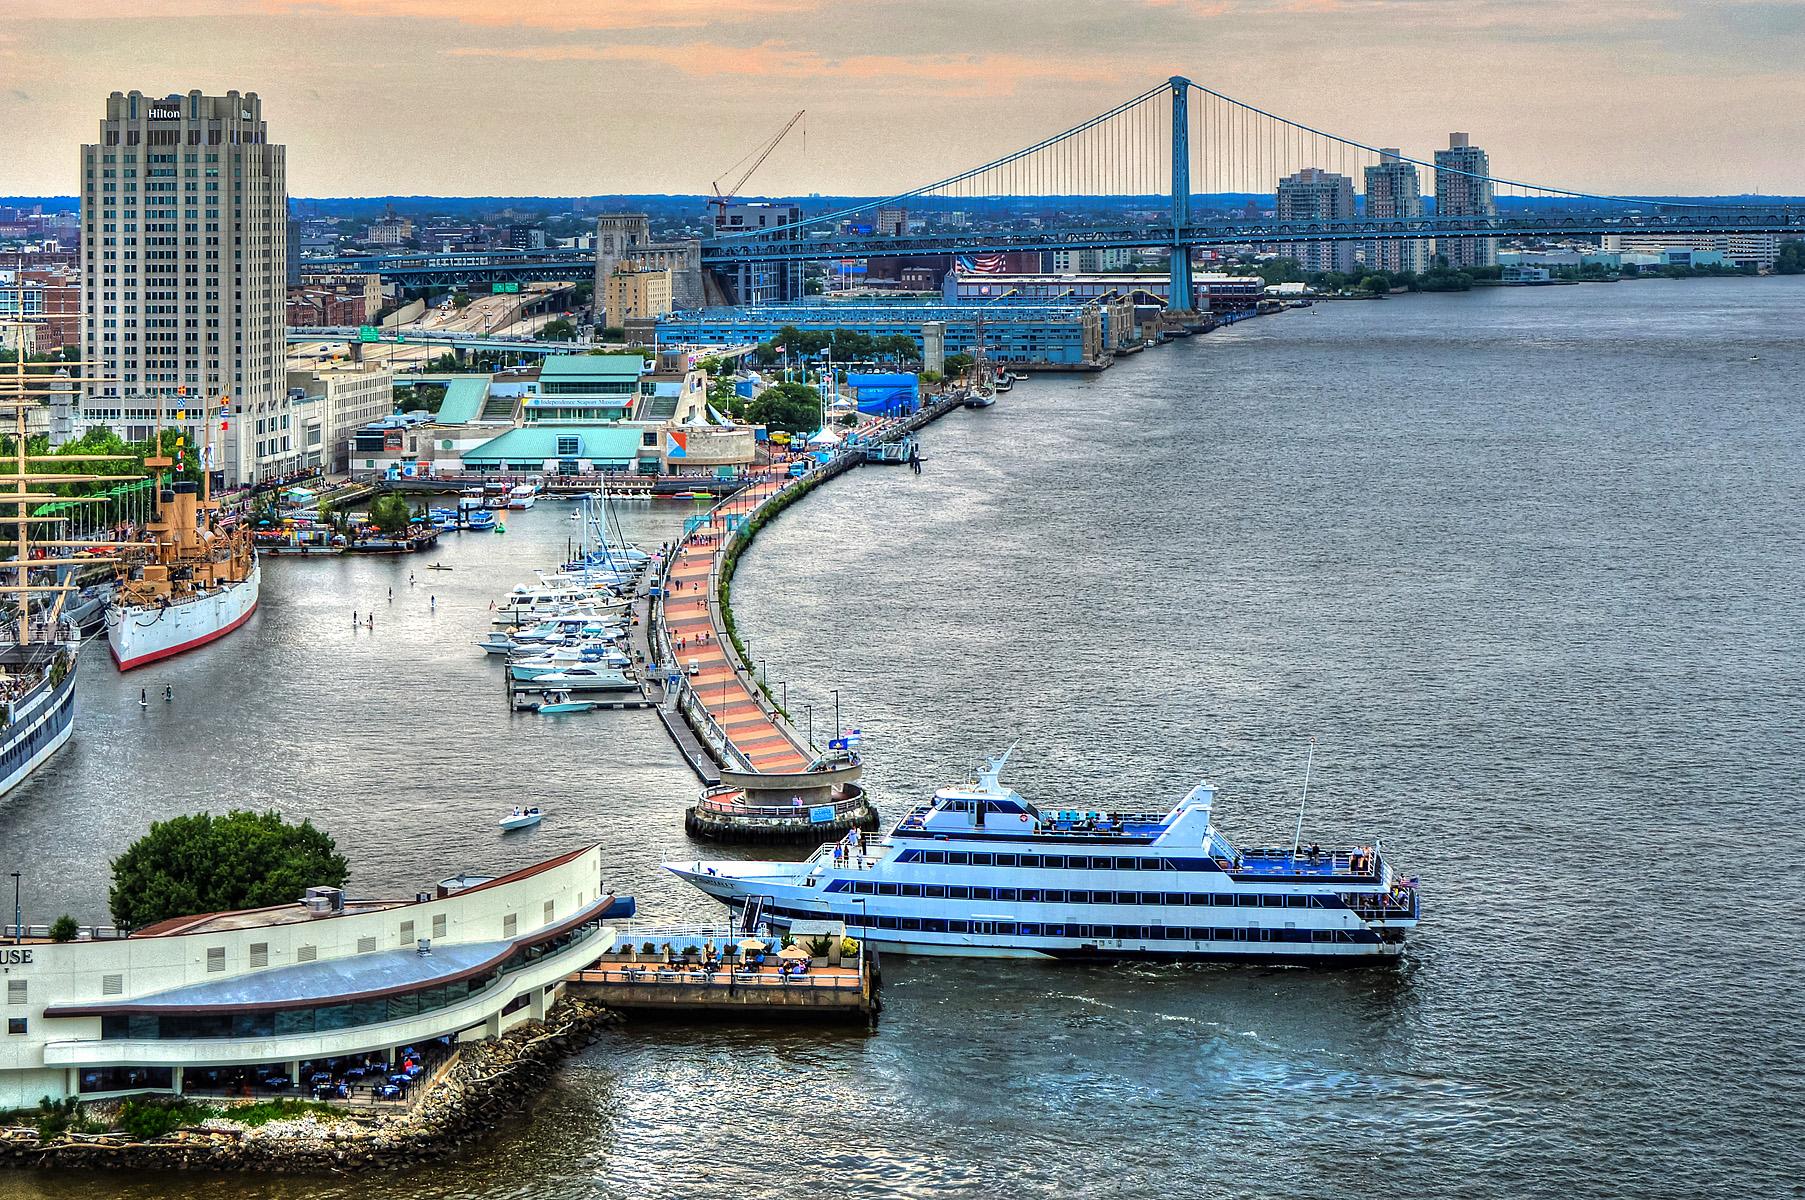 Dockside blog_View of Delaware River & Ben Franklin Bridge